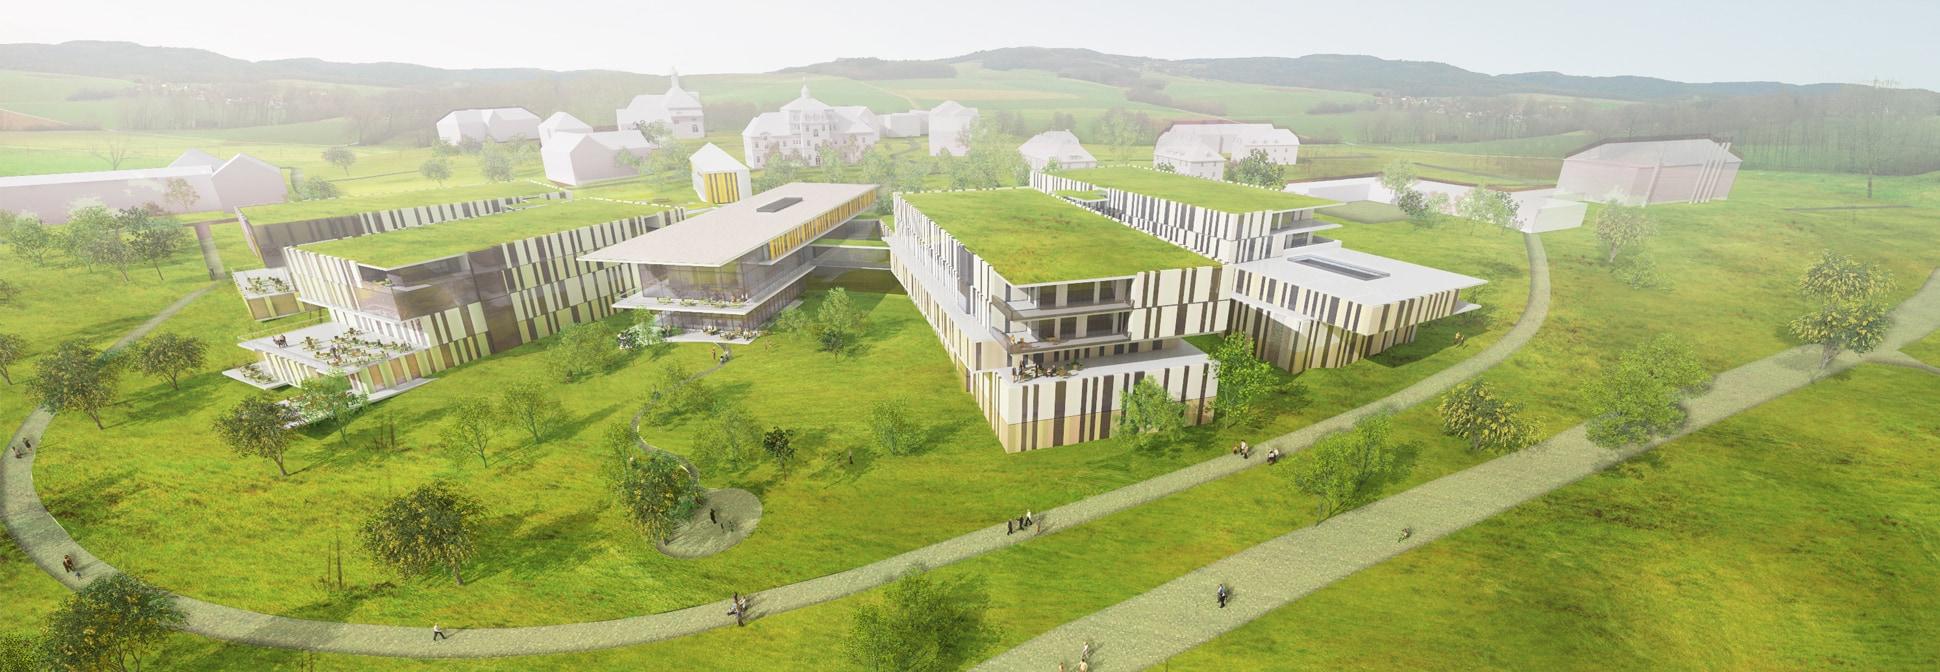 Neubau Bezirksklinikum Obermain, Rendering